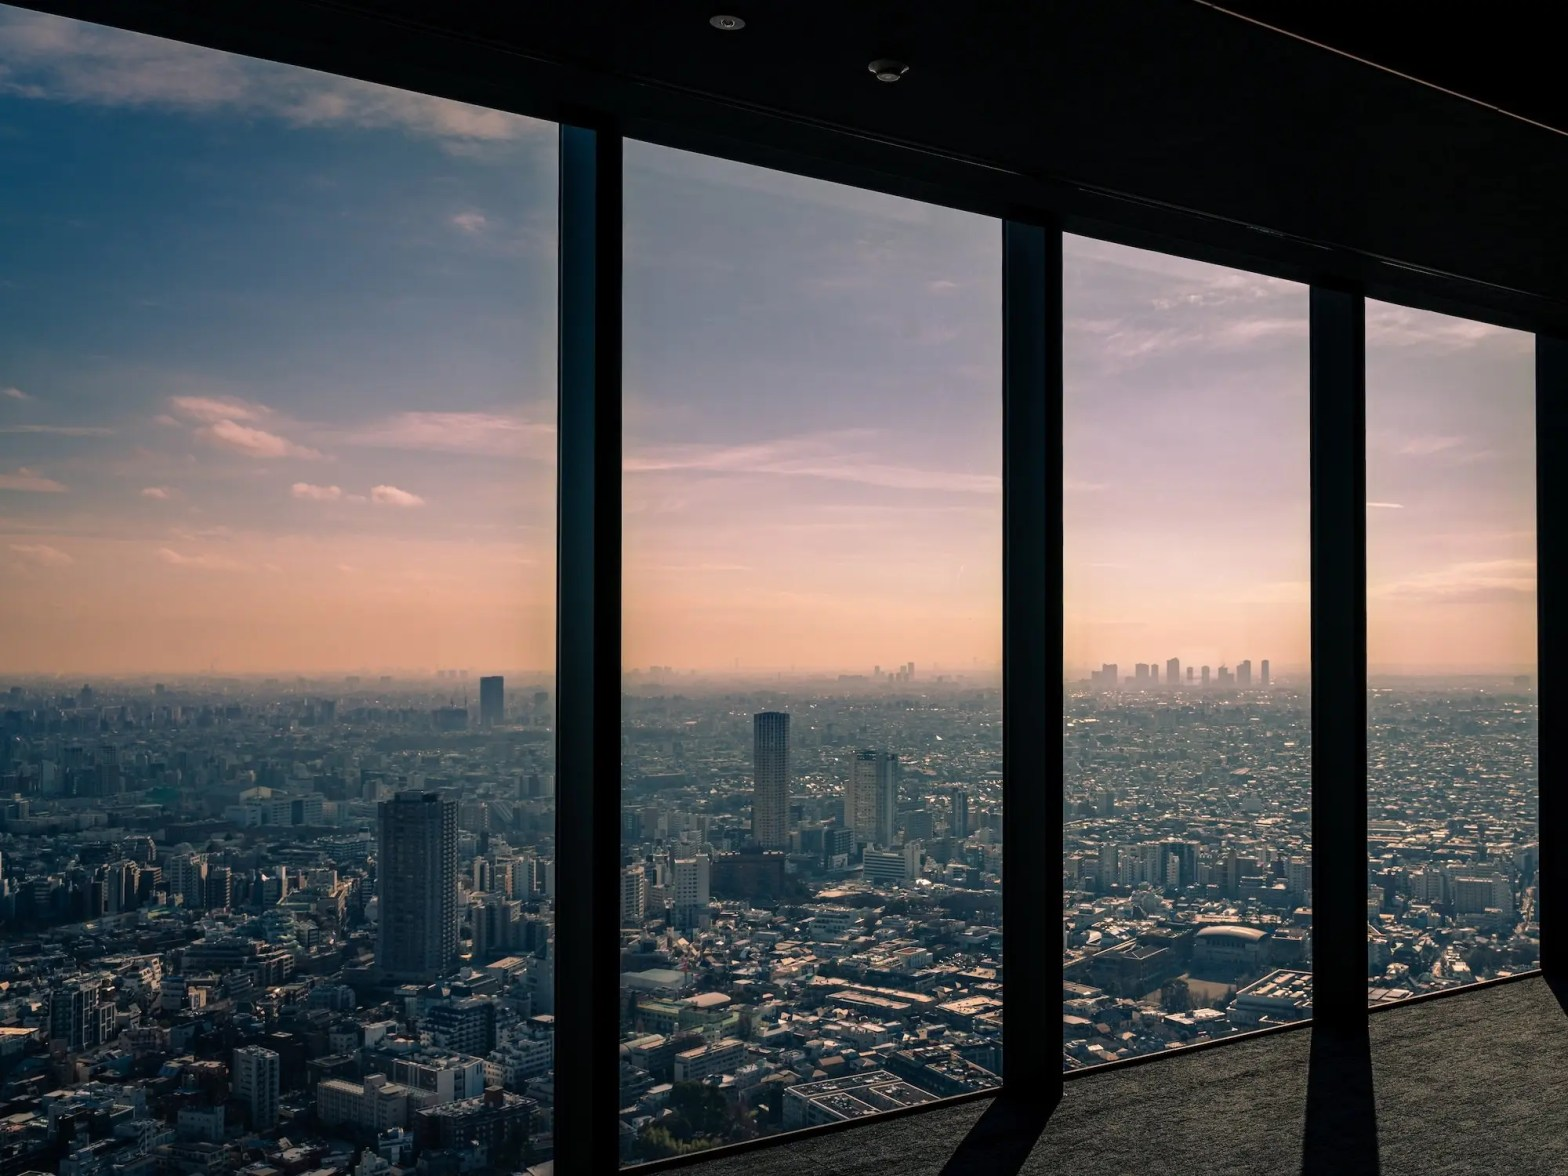 10 beste budget hotels in Tokyo